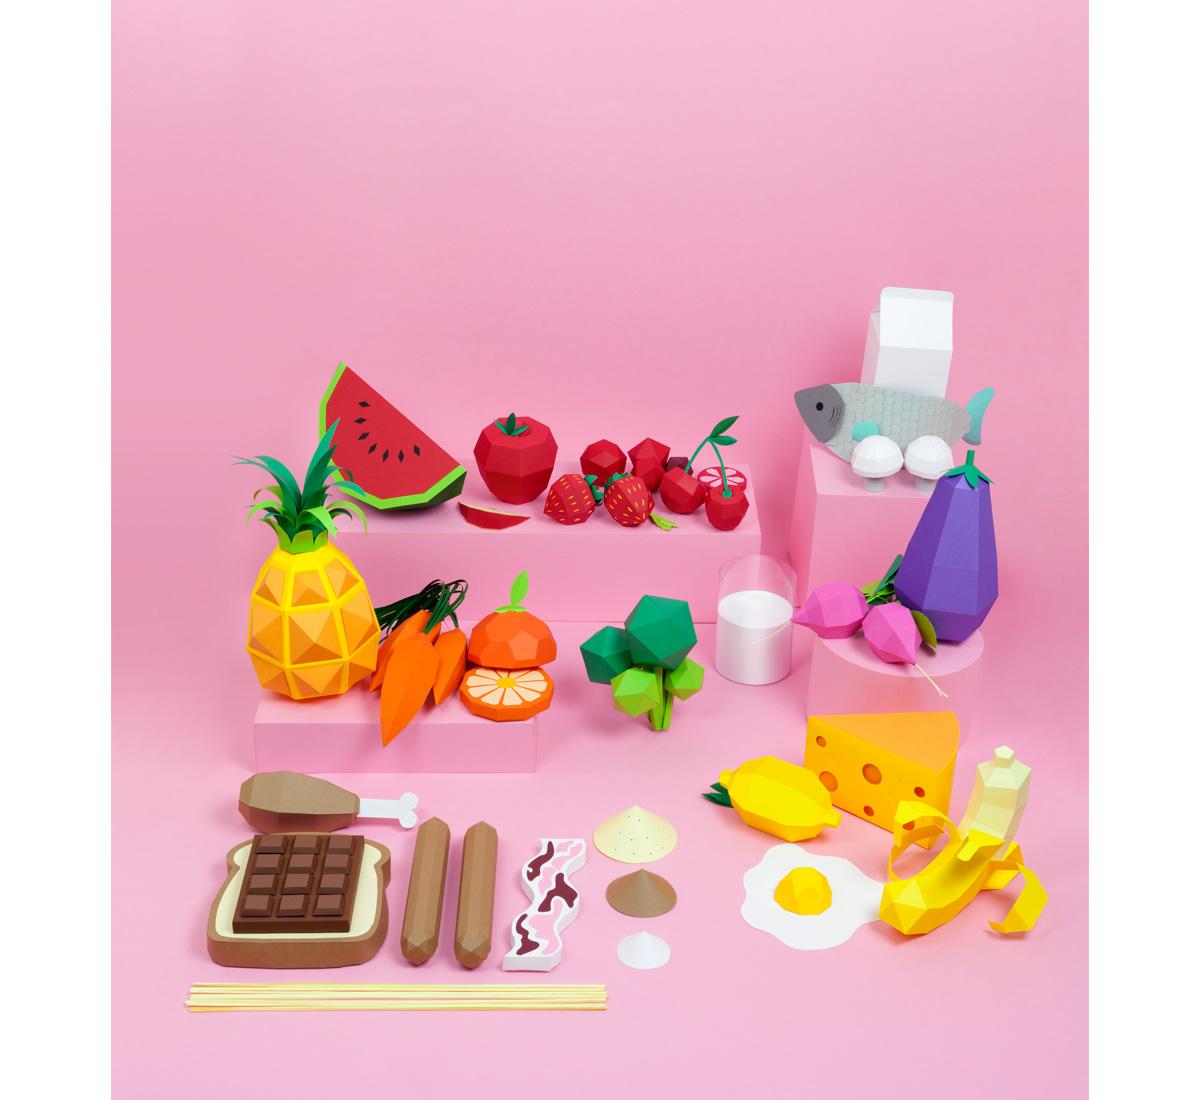 lobulo-ms-balloon-handmade-graphic-design